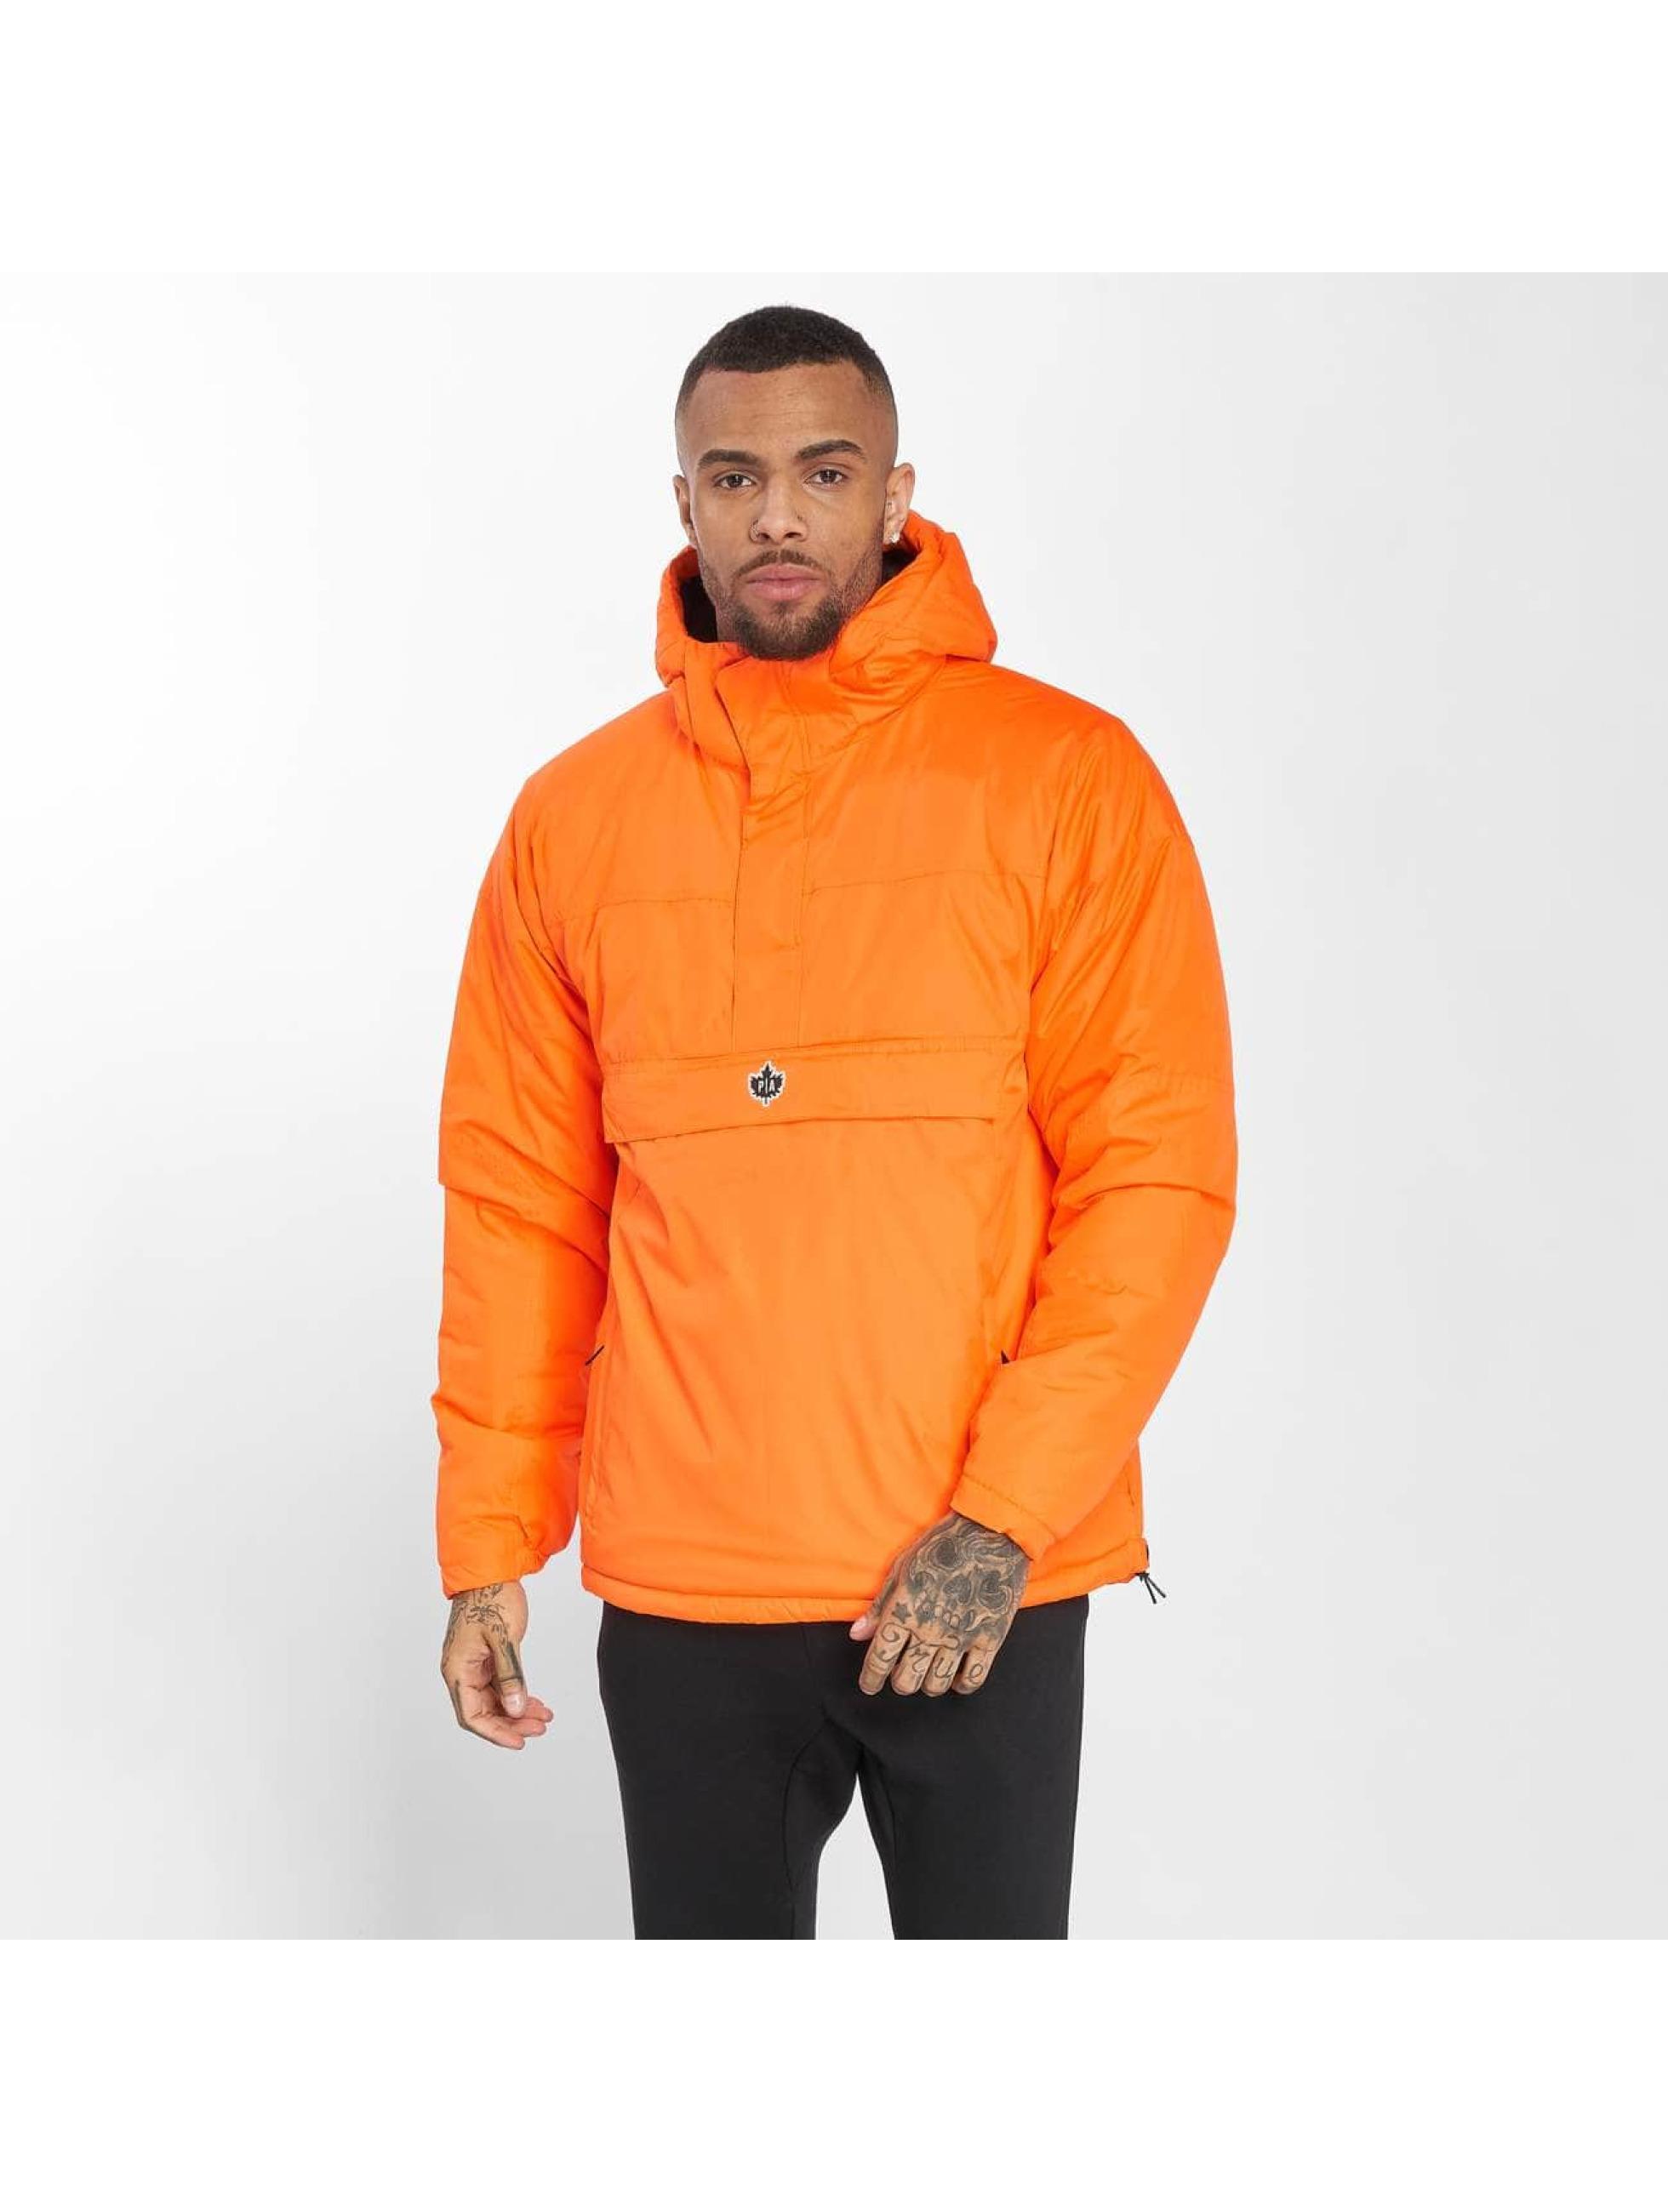 K1X Manteau hiver Urban MK4 orange